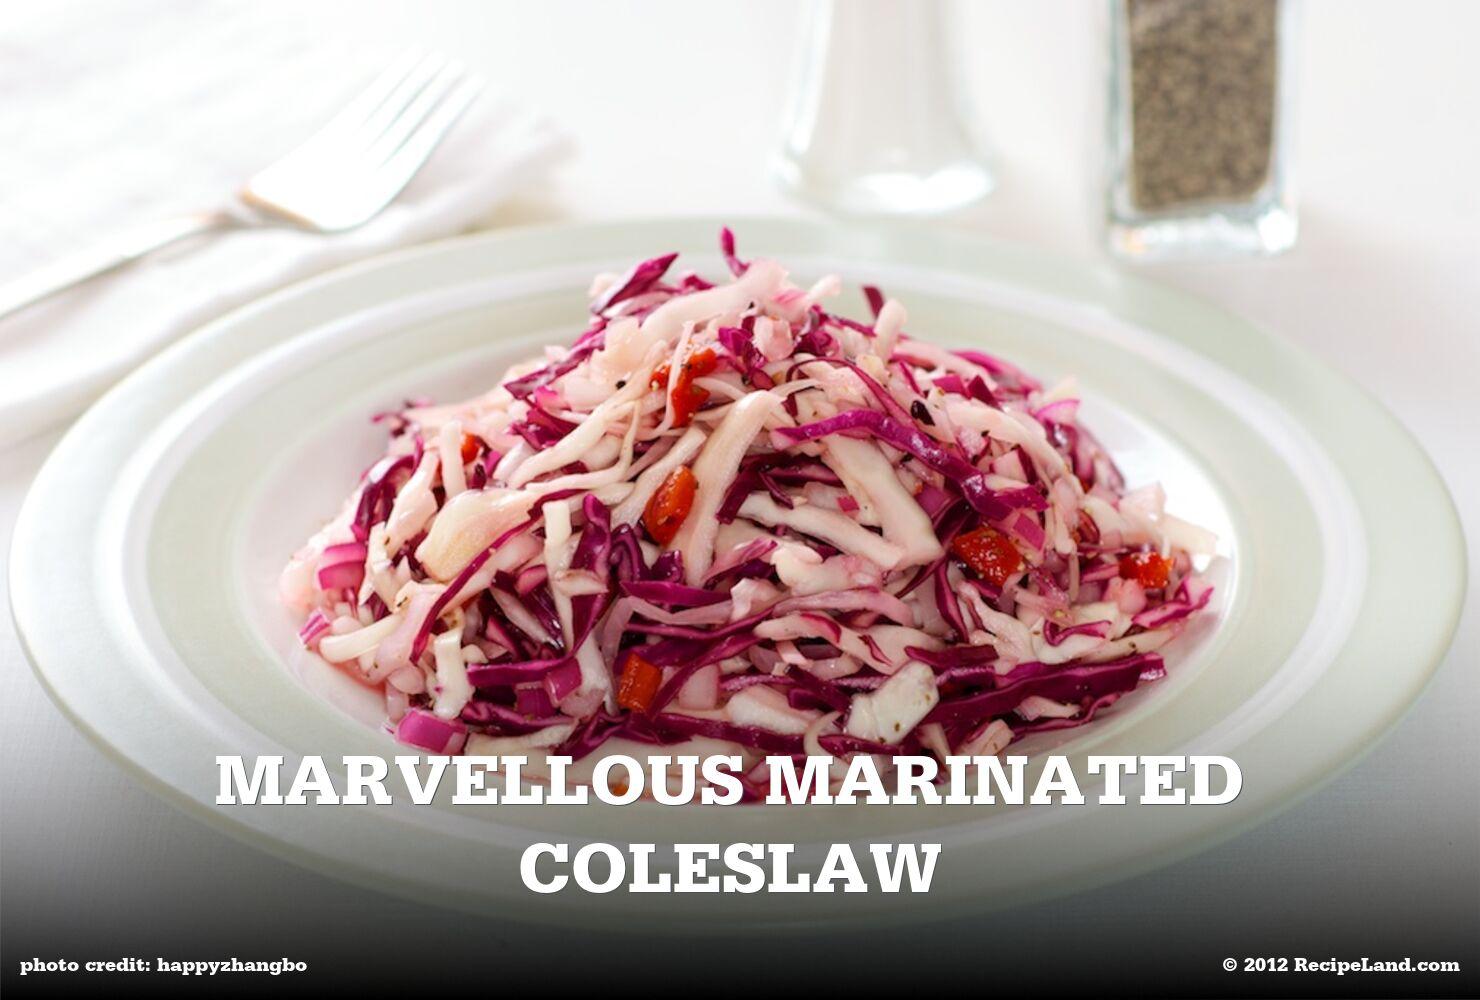 Marvellous Marinated Coleslaw